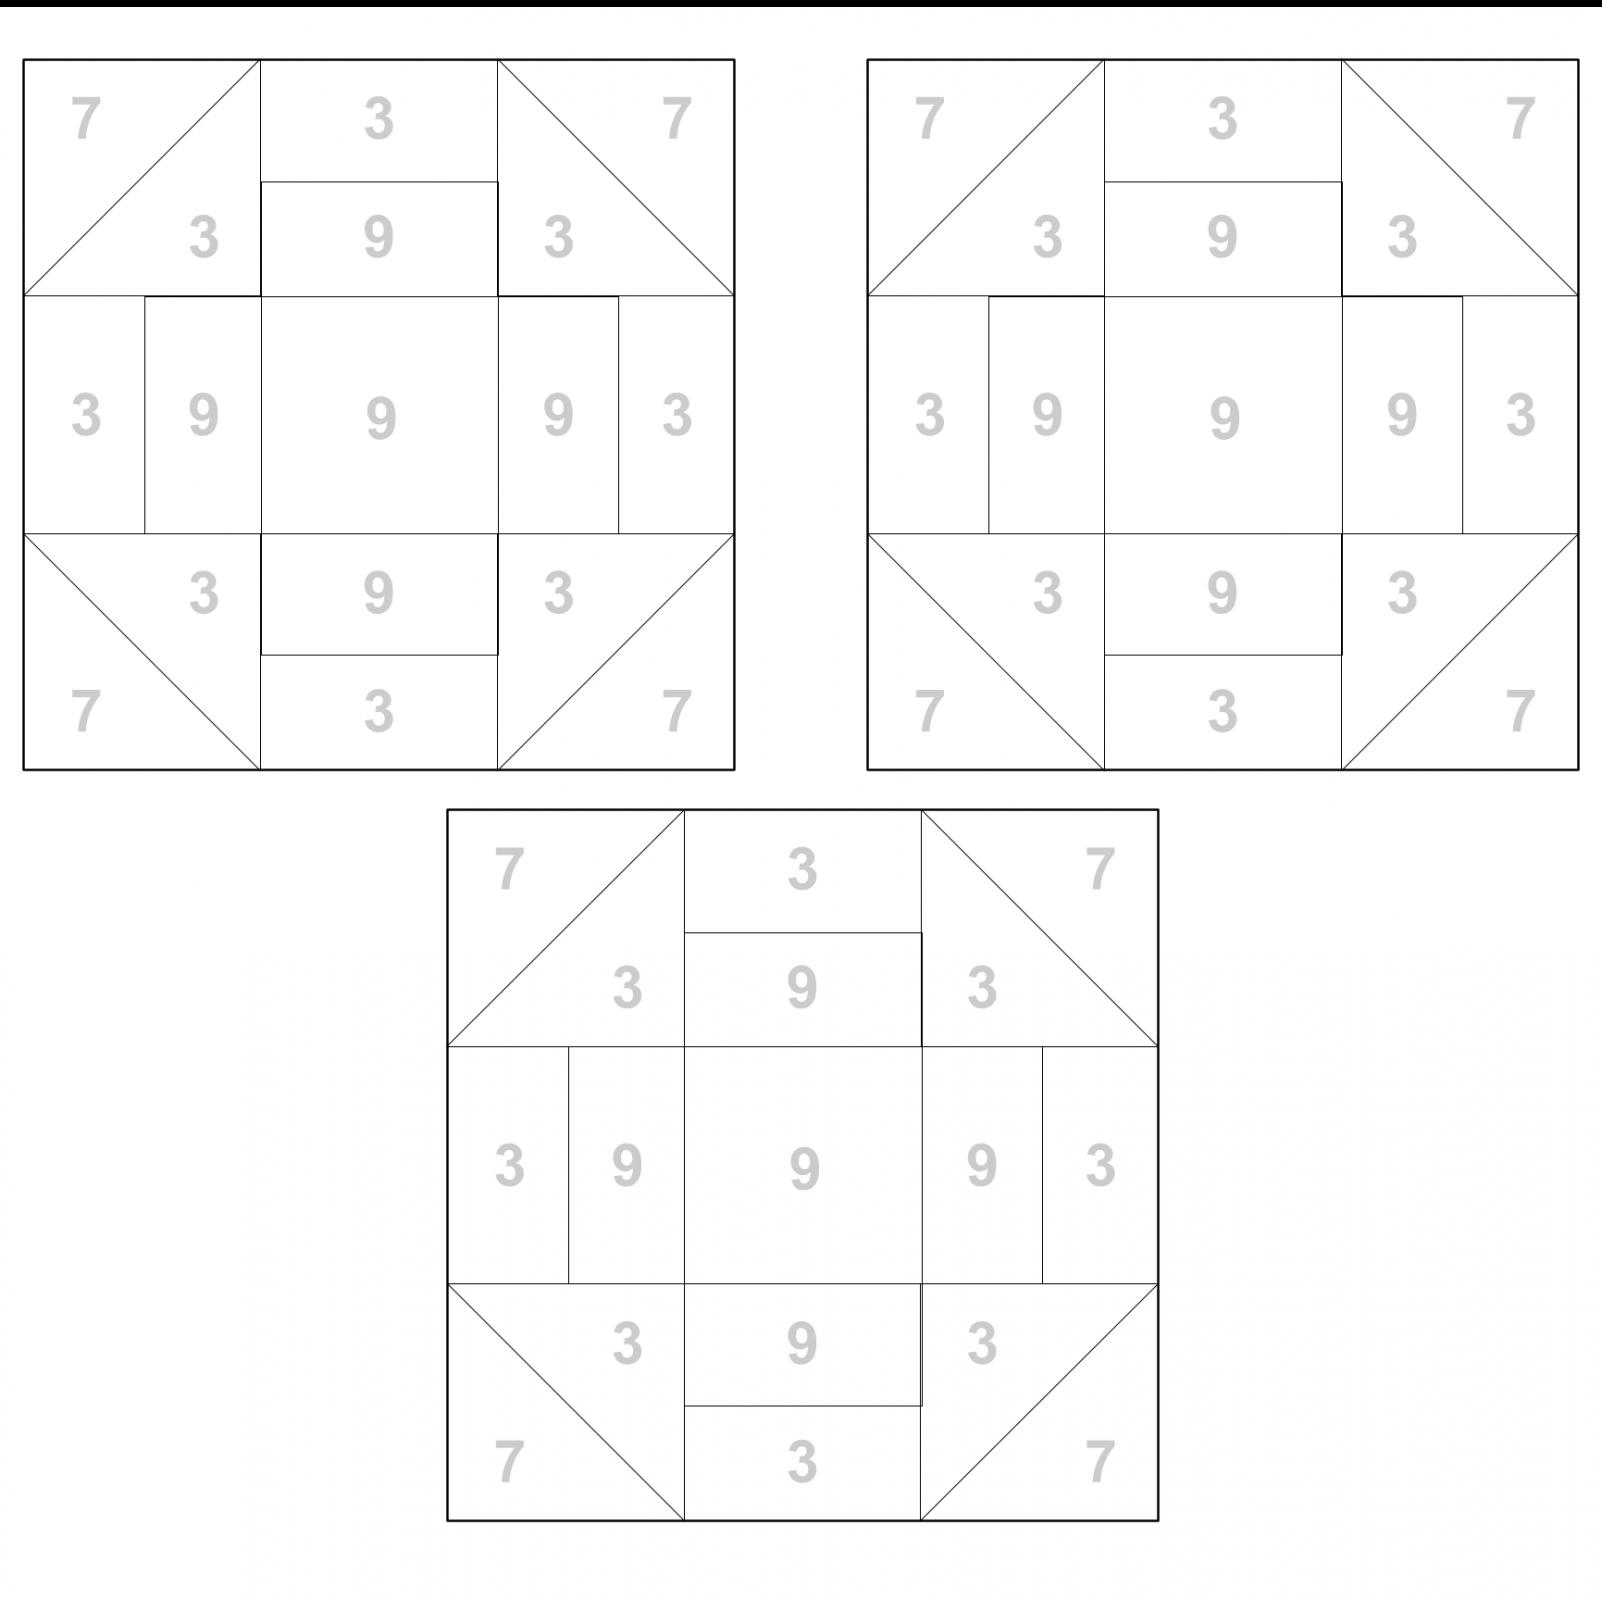 SS2021 Block 9 Coloring Sheet